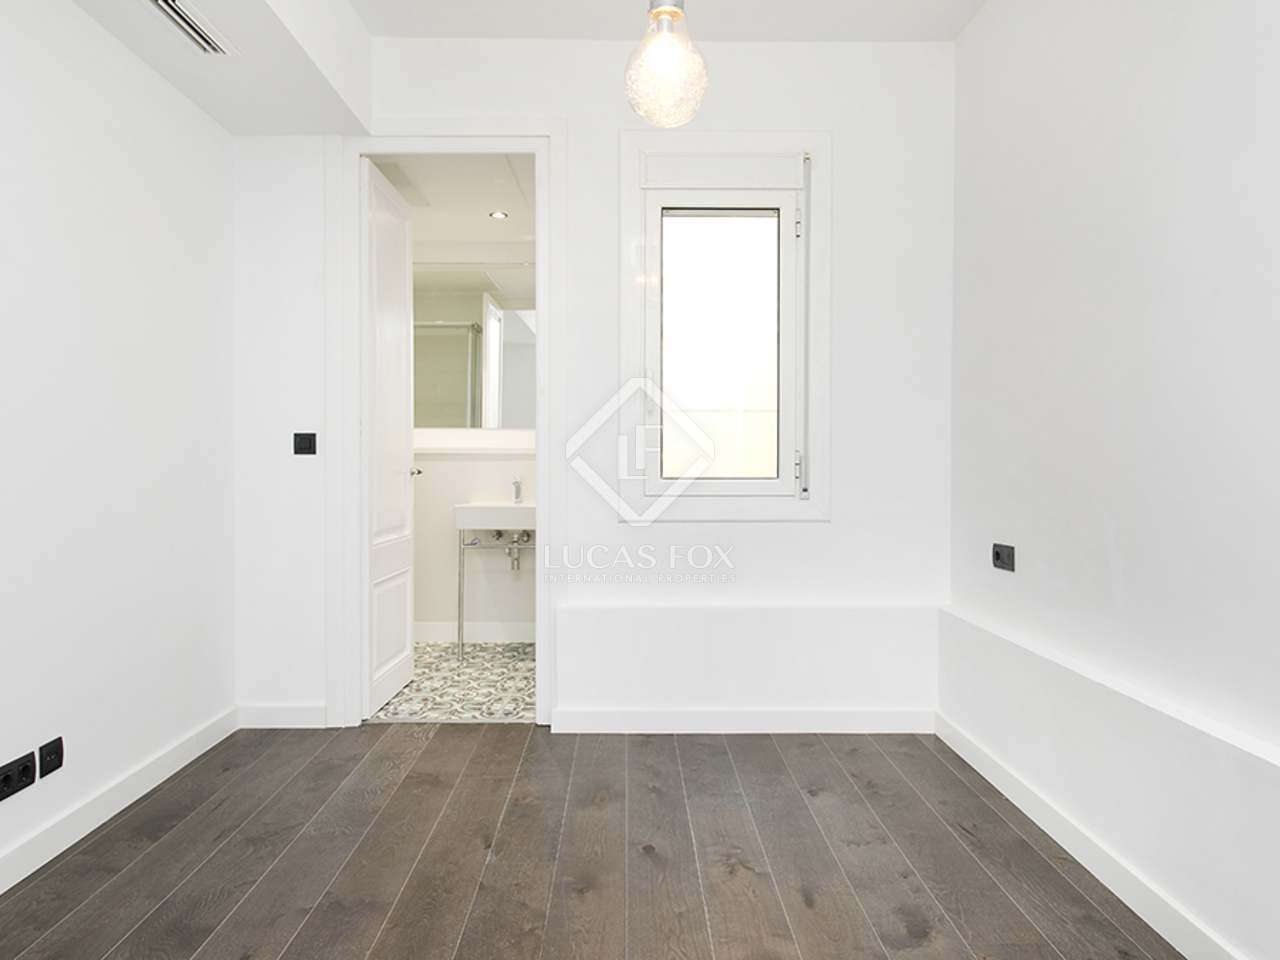 Appartement de 64m a vendre barceloneta barcelone - Appartement a vendre barcelone ...